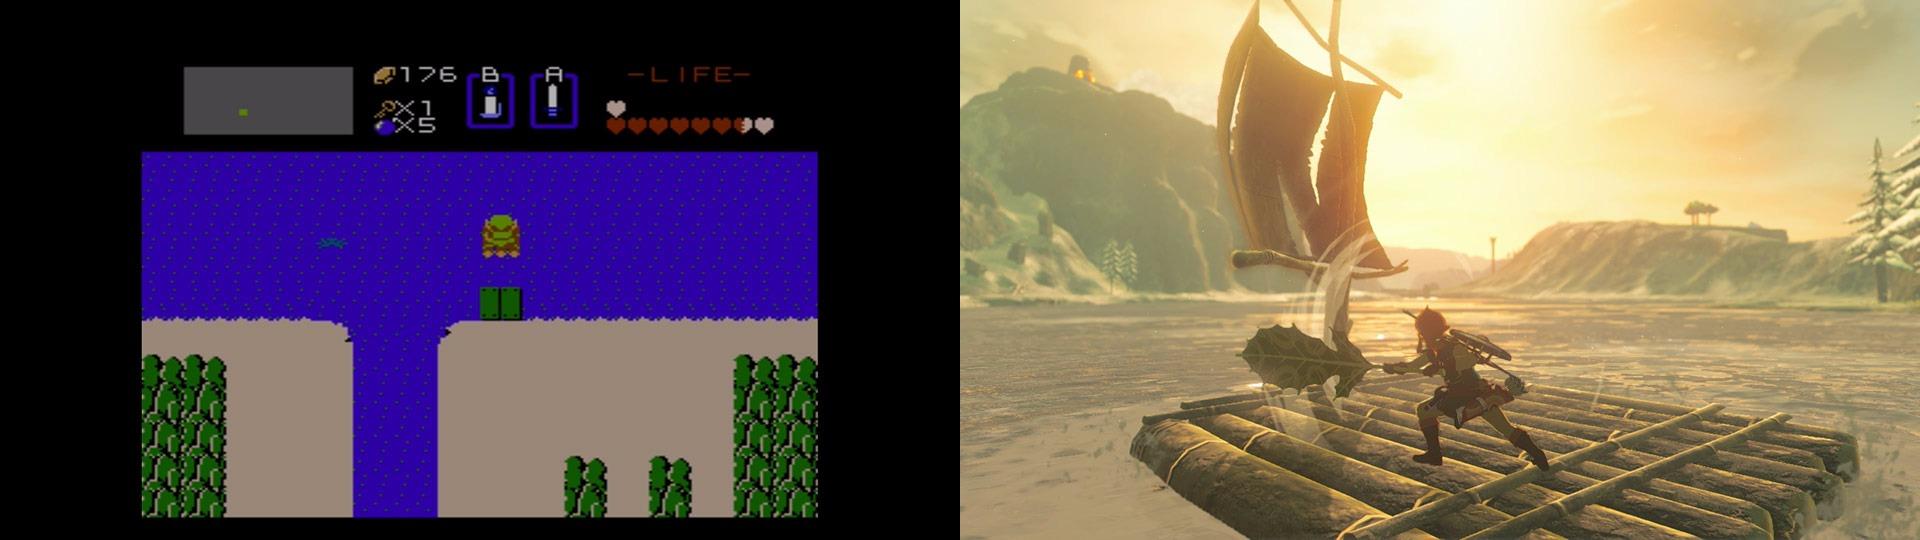 Nintendo Compares The Original Zelda To Breath Of The Wild